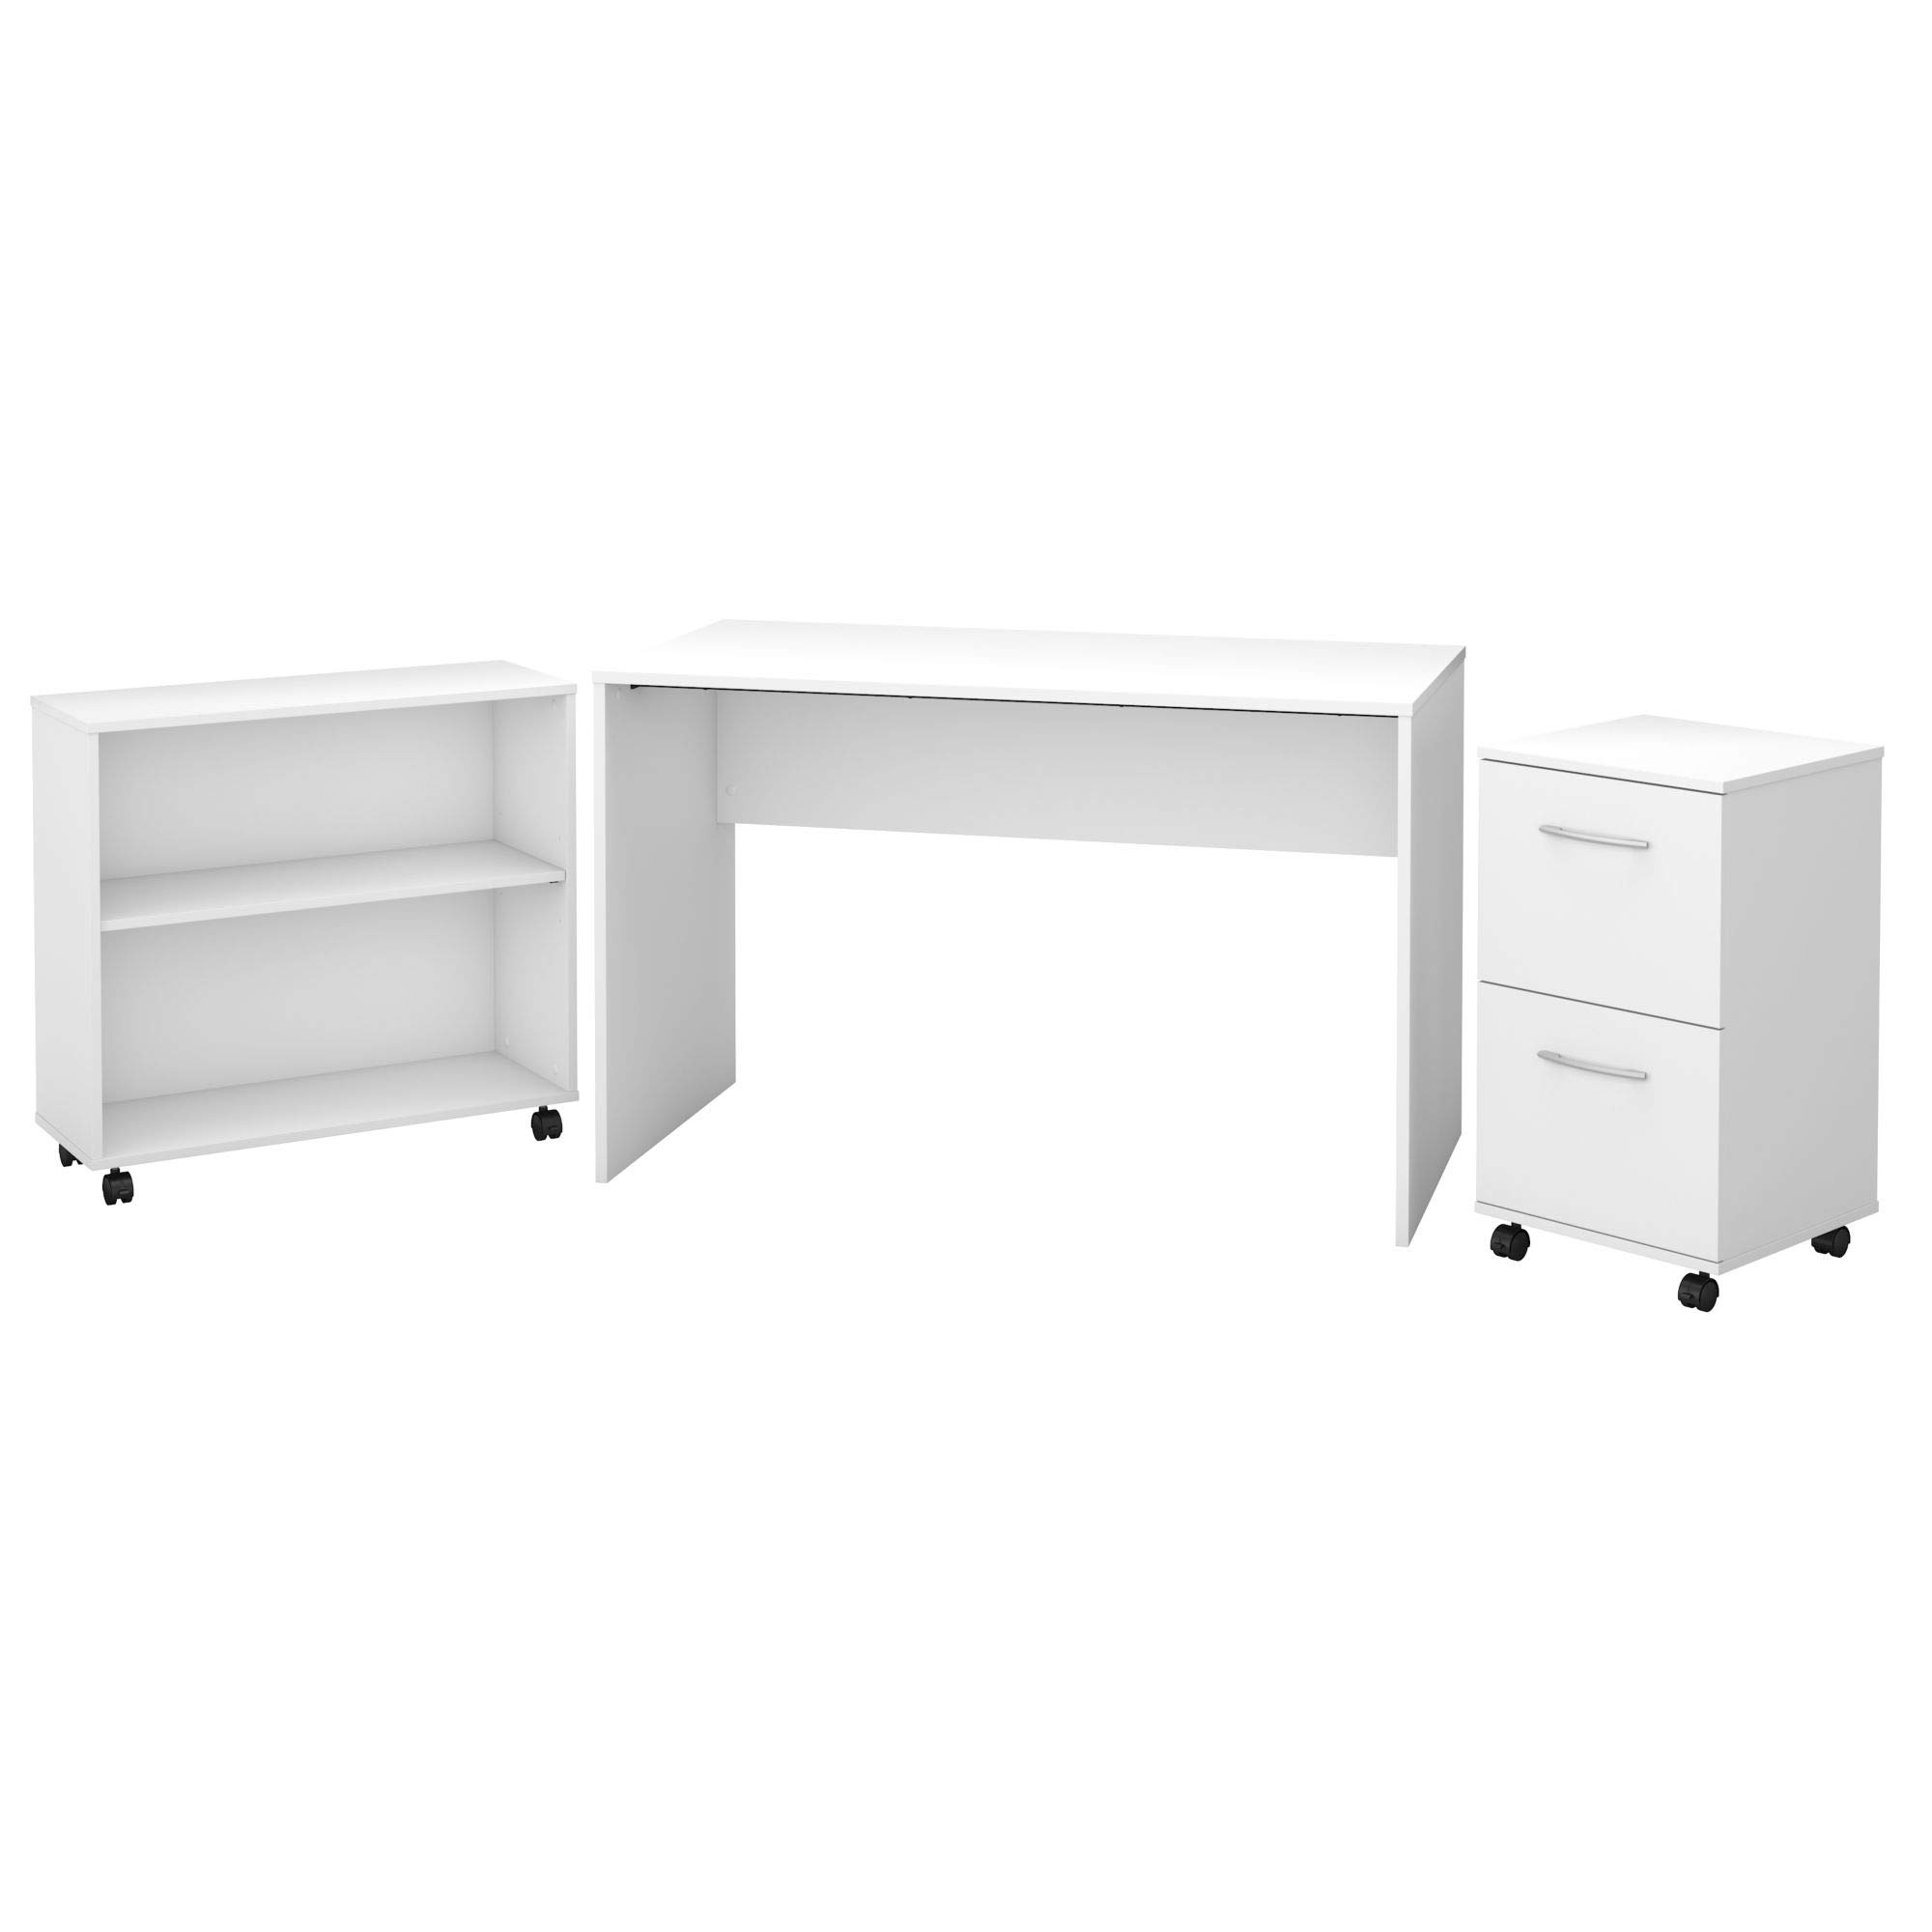 Bush Furniture Office Complete Small Desk with Mobile File Cabinet and Bookcase in Pure White